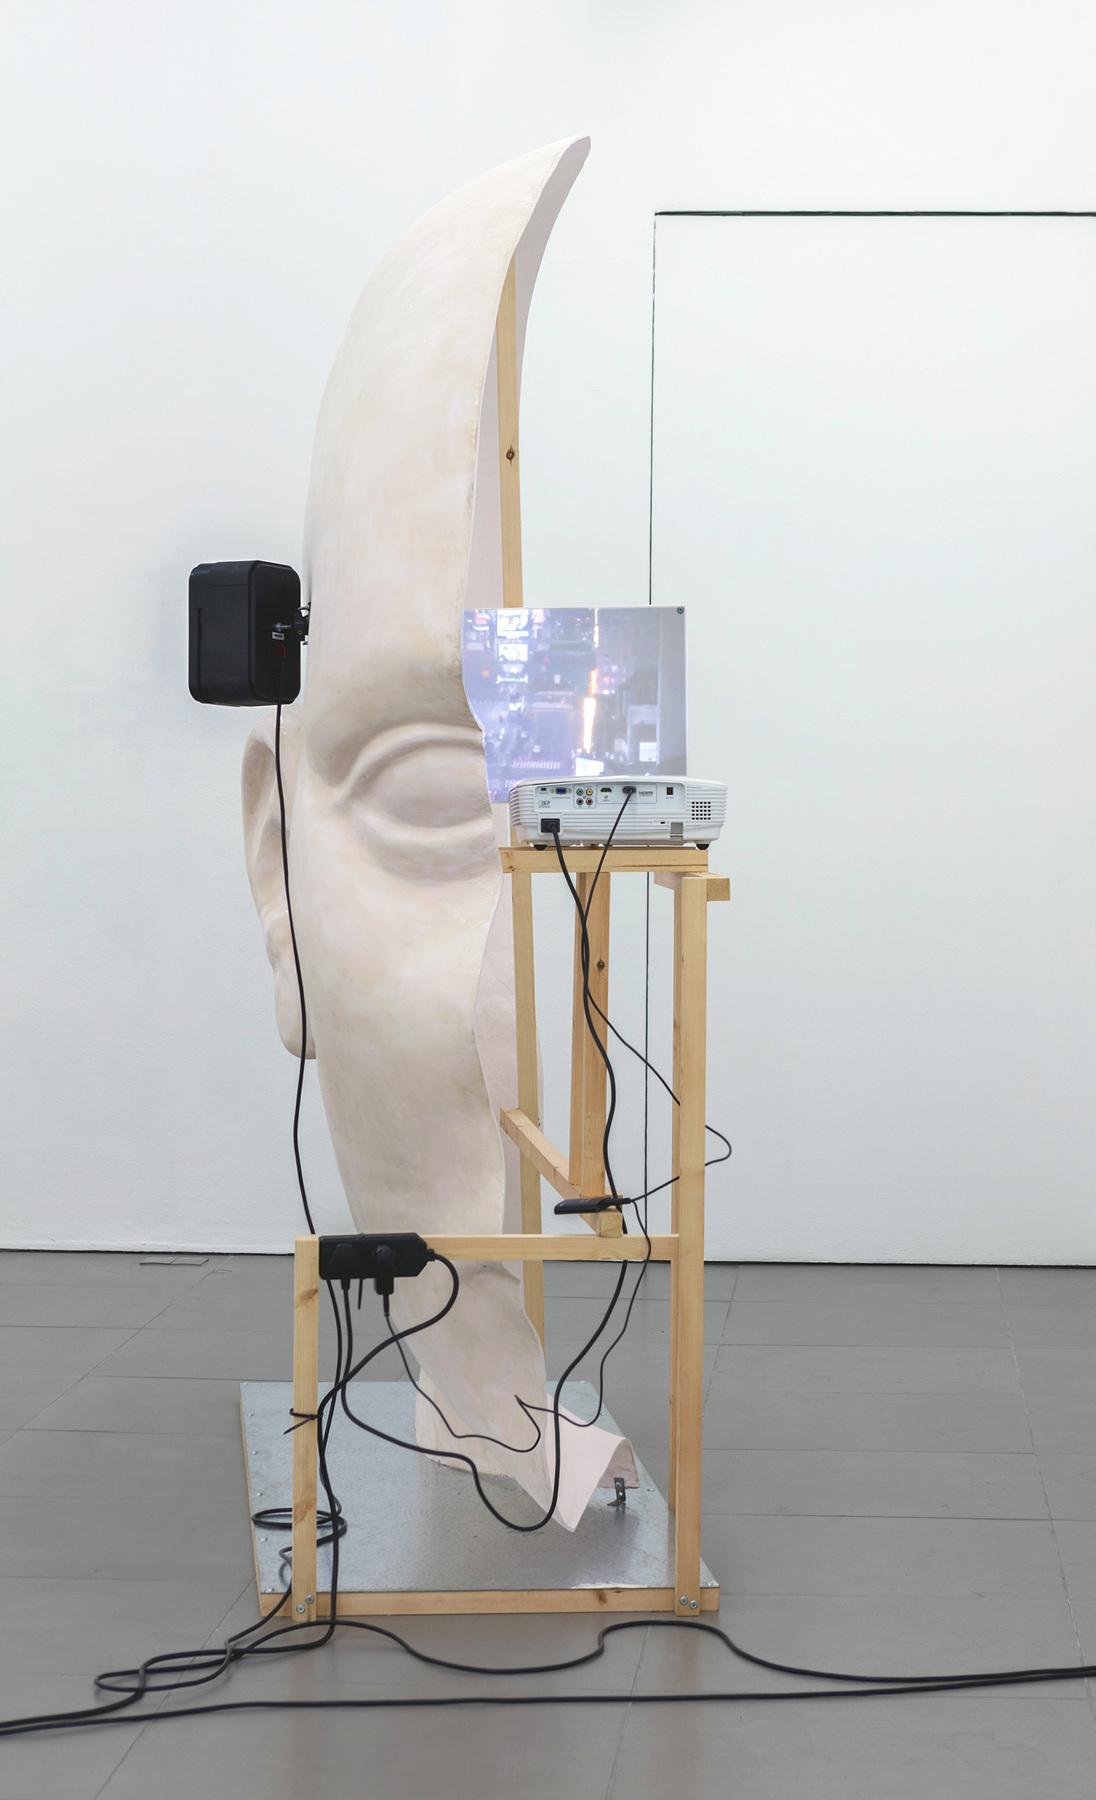 08. Anne de Vries, SUBMISSION 2015, wood, metal, fibreglass resin, audio, video